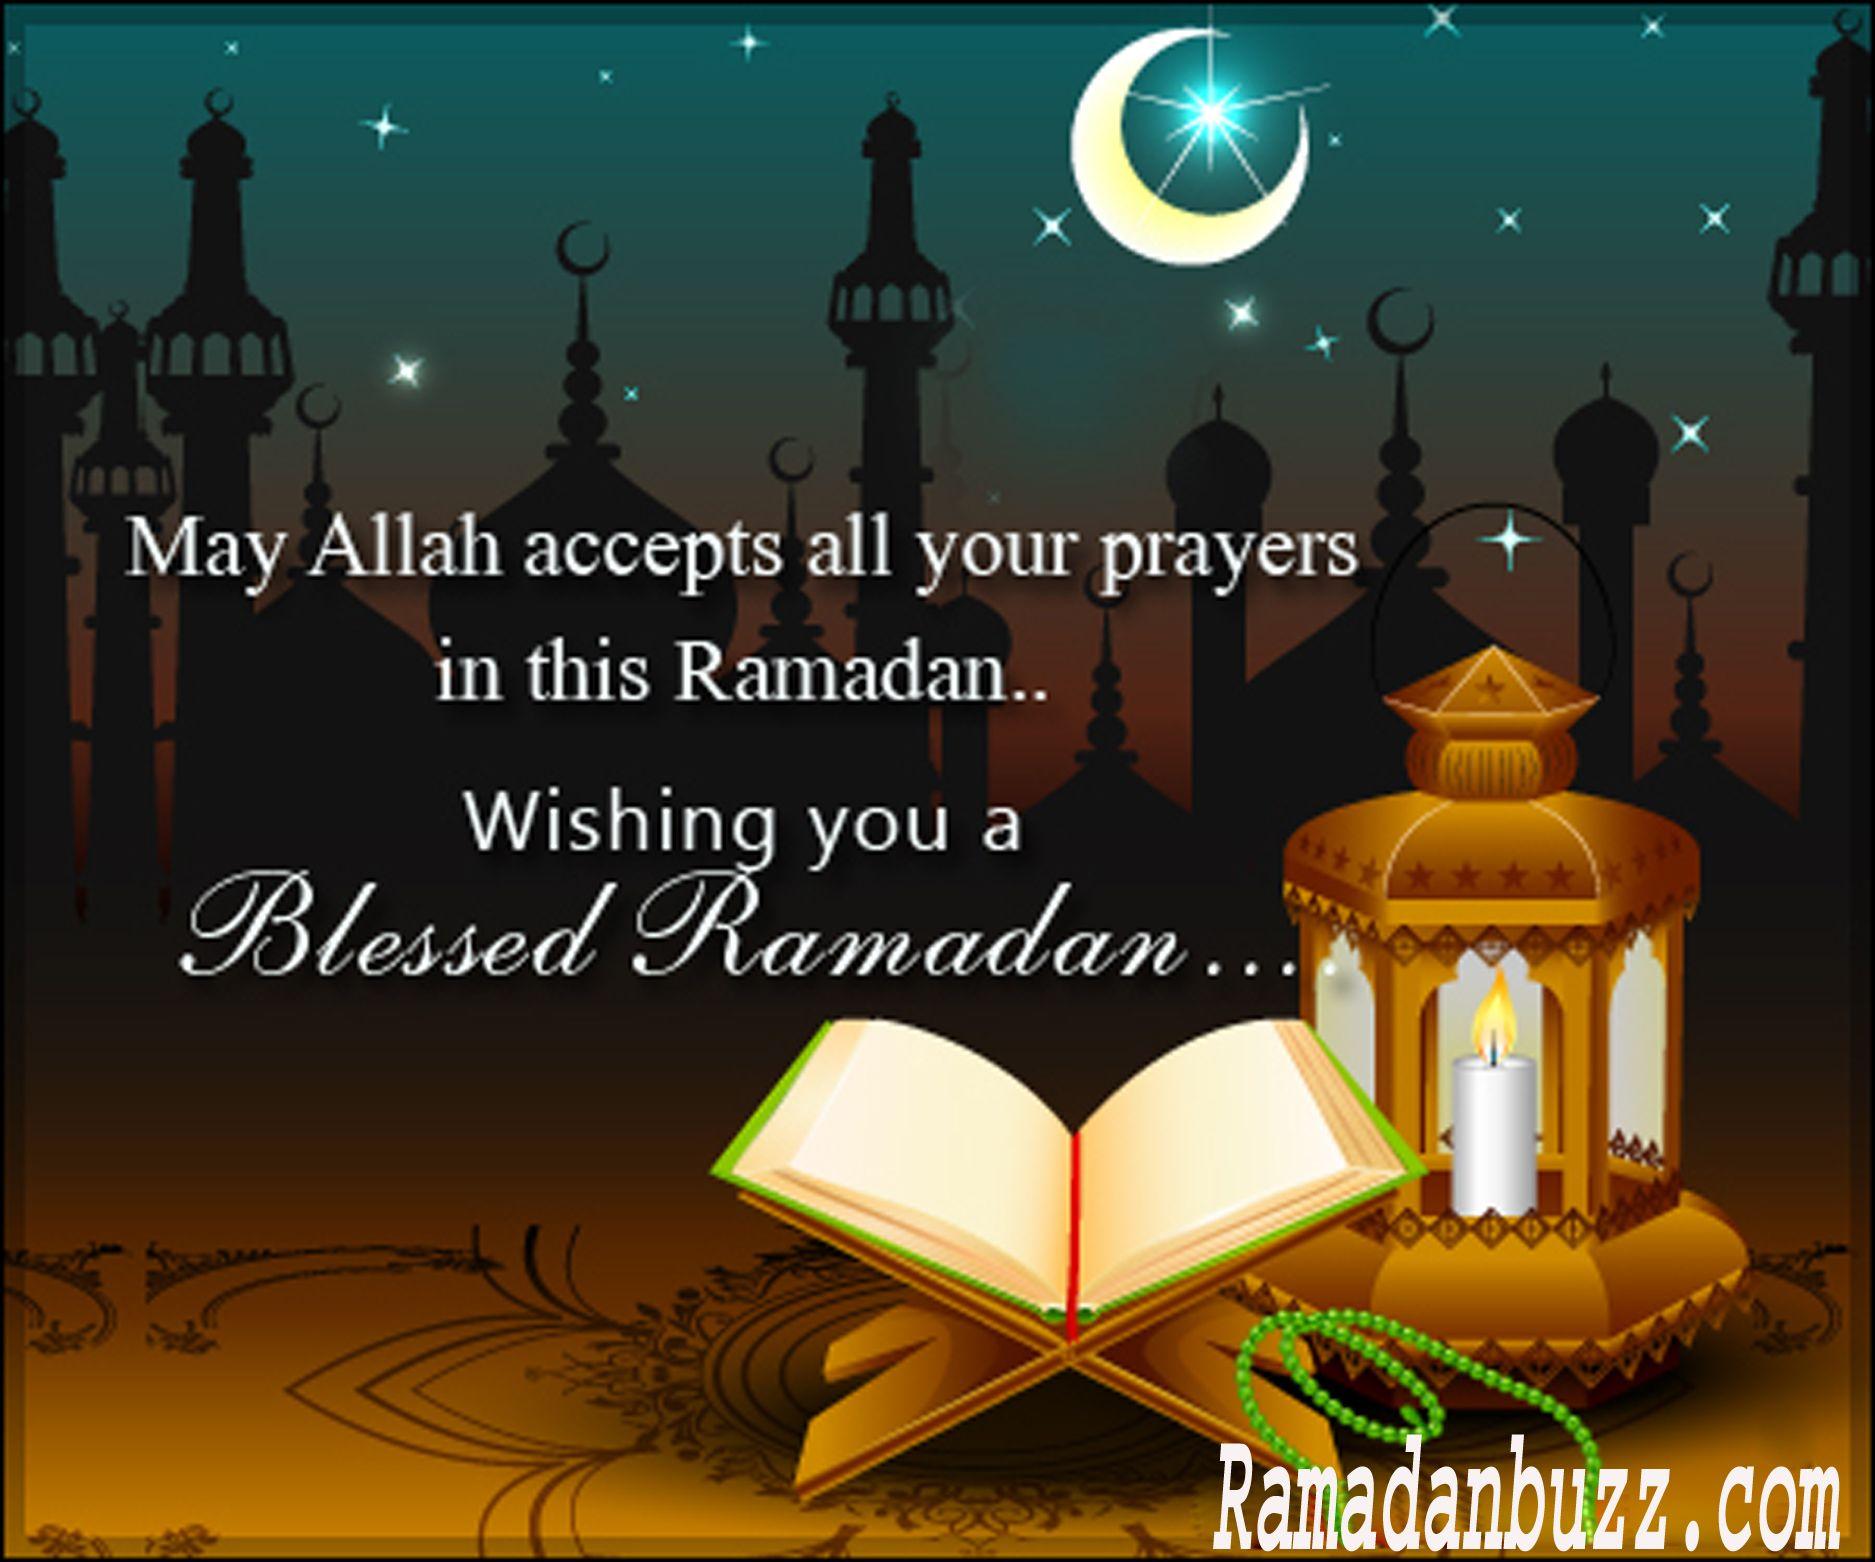 Ramadanmubarak Ramdan2019 Ramadanquotes Ramadangreetings Ramadanwishes Ramadanmubarakdp Ram Ramadan Wishes Ramadan Wishes Messages Ramadan Wishes Images